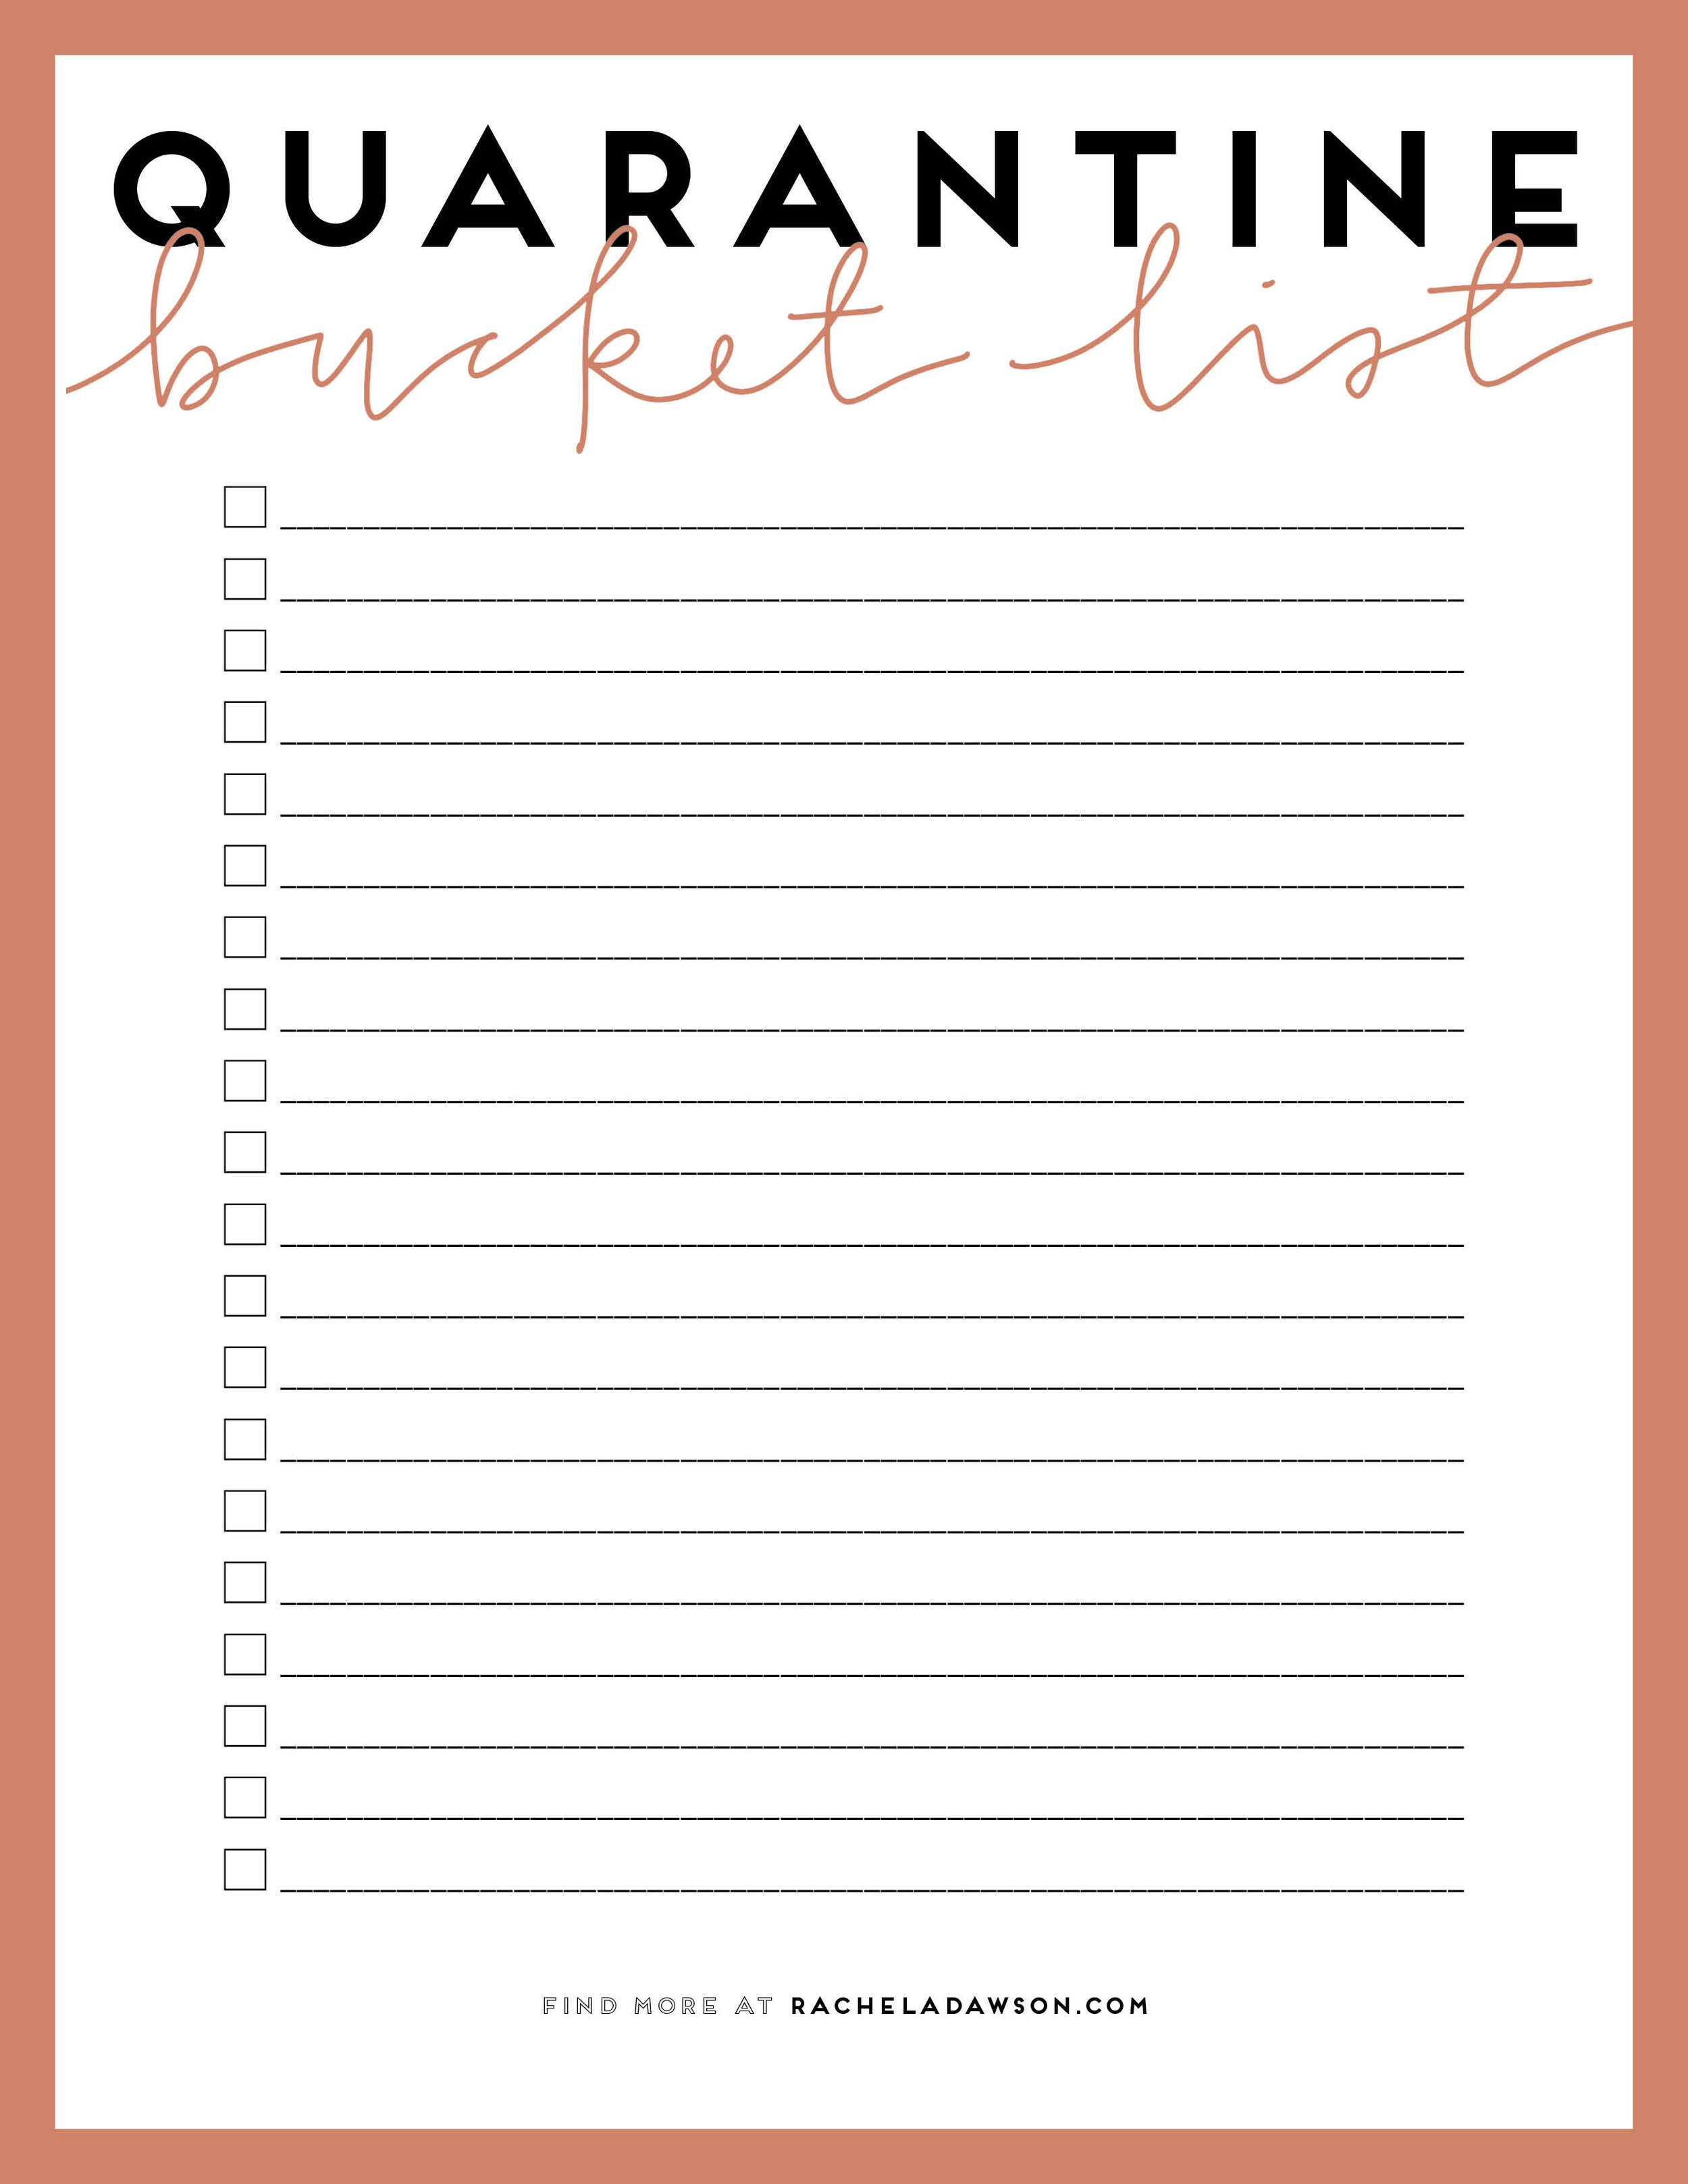 A Quarantine Bucket List 50 Ideas A Free Printable Rachel A Dawson